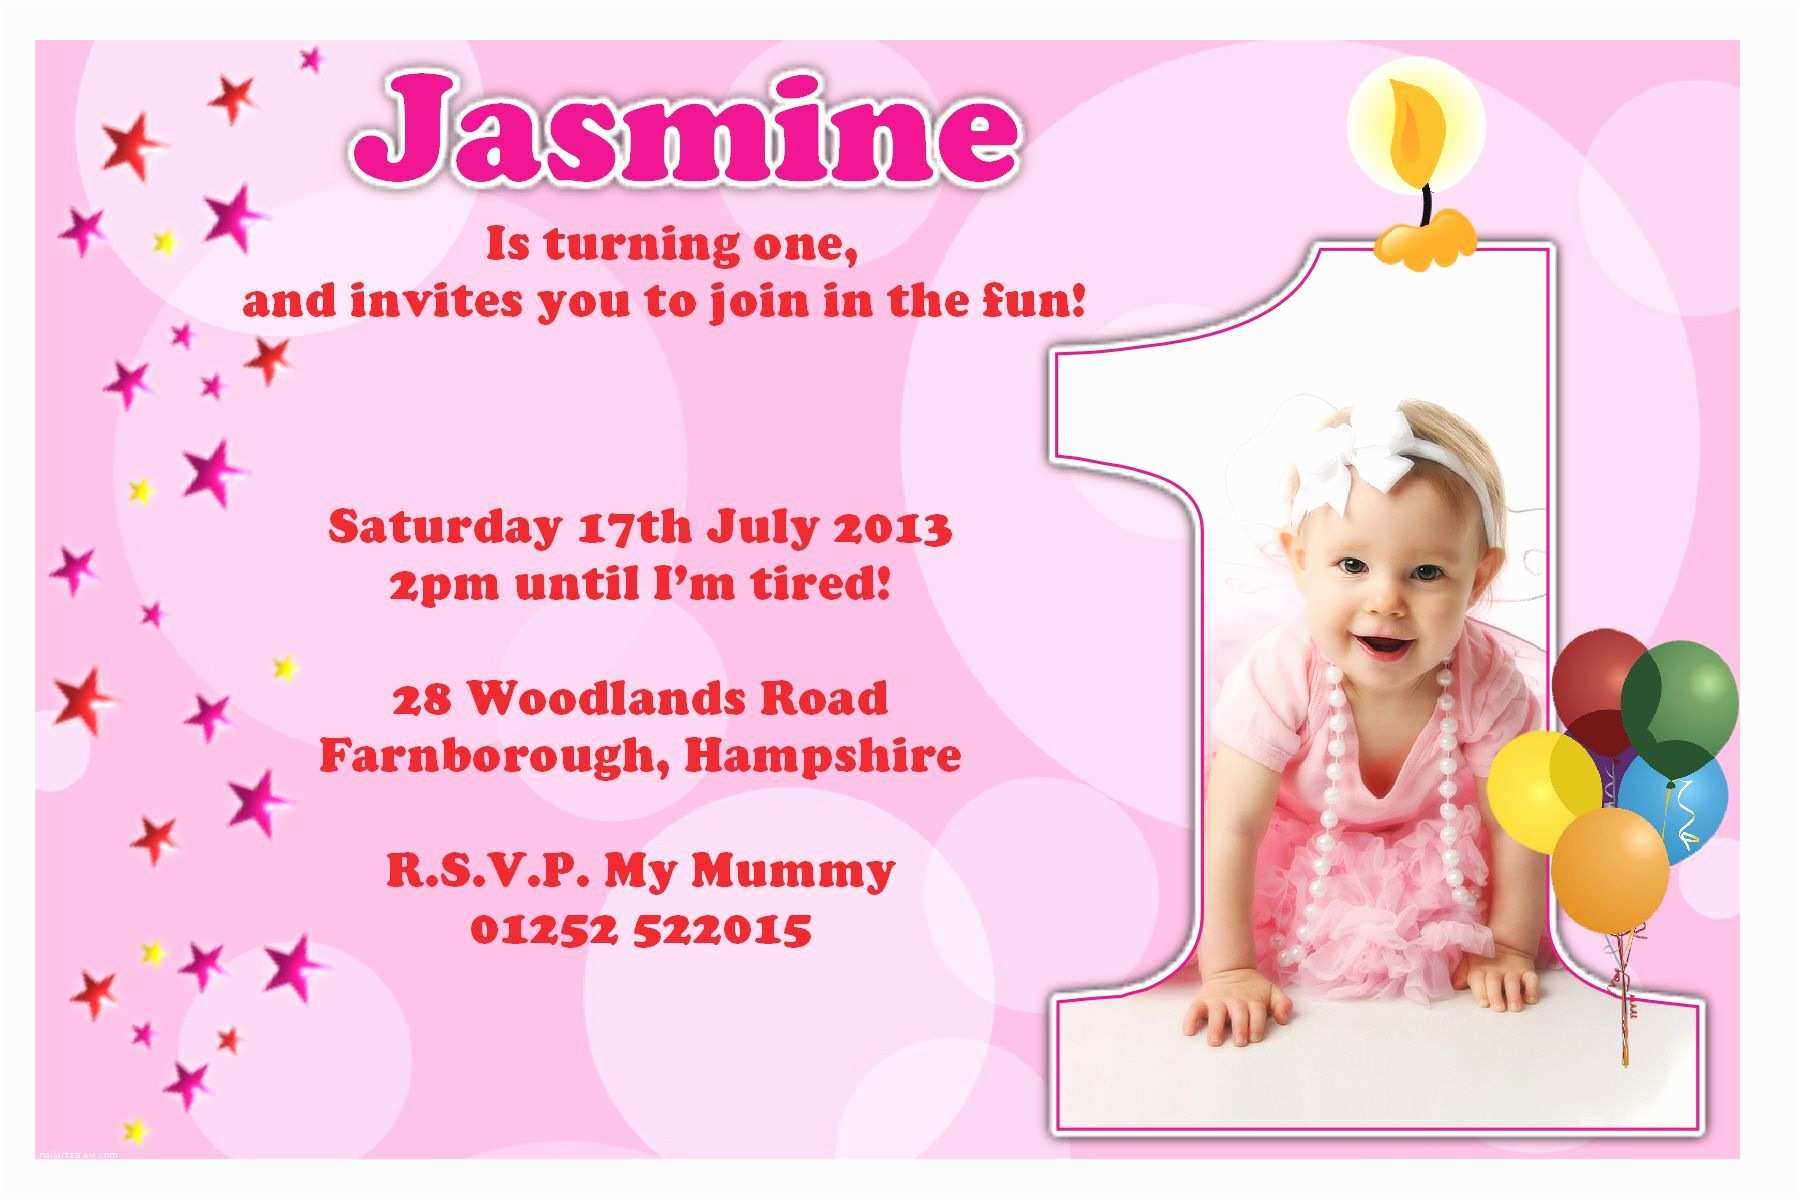 1st Birthday Invitations Girl 1st Birthday Invitations Girl Free Template Baby Girl S